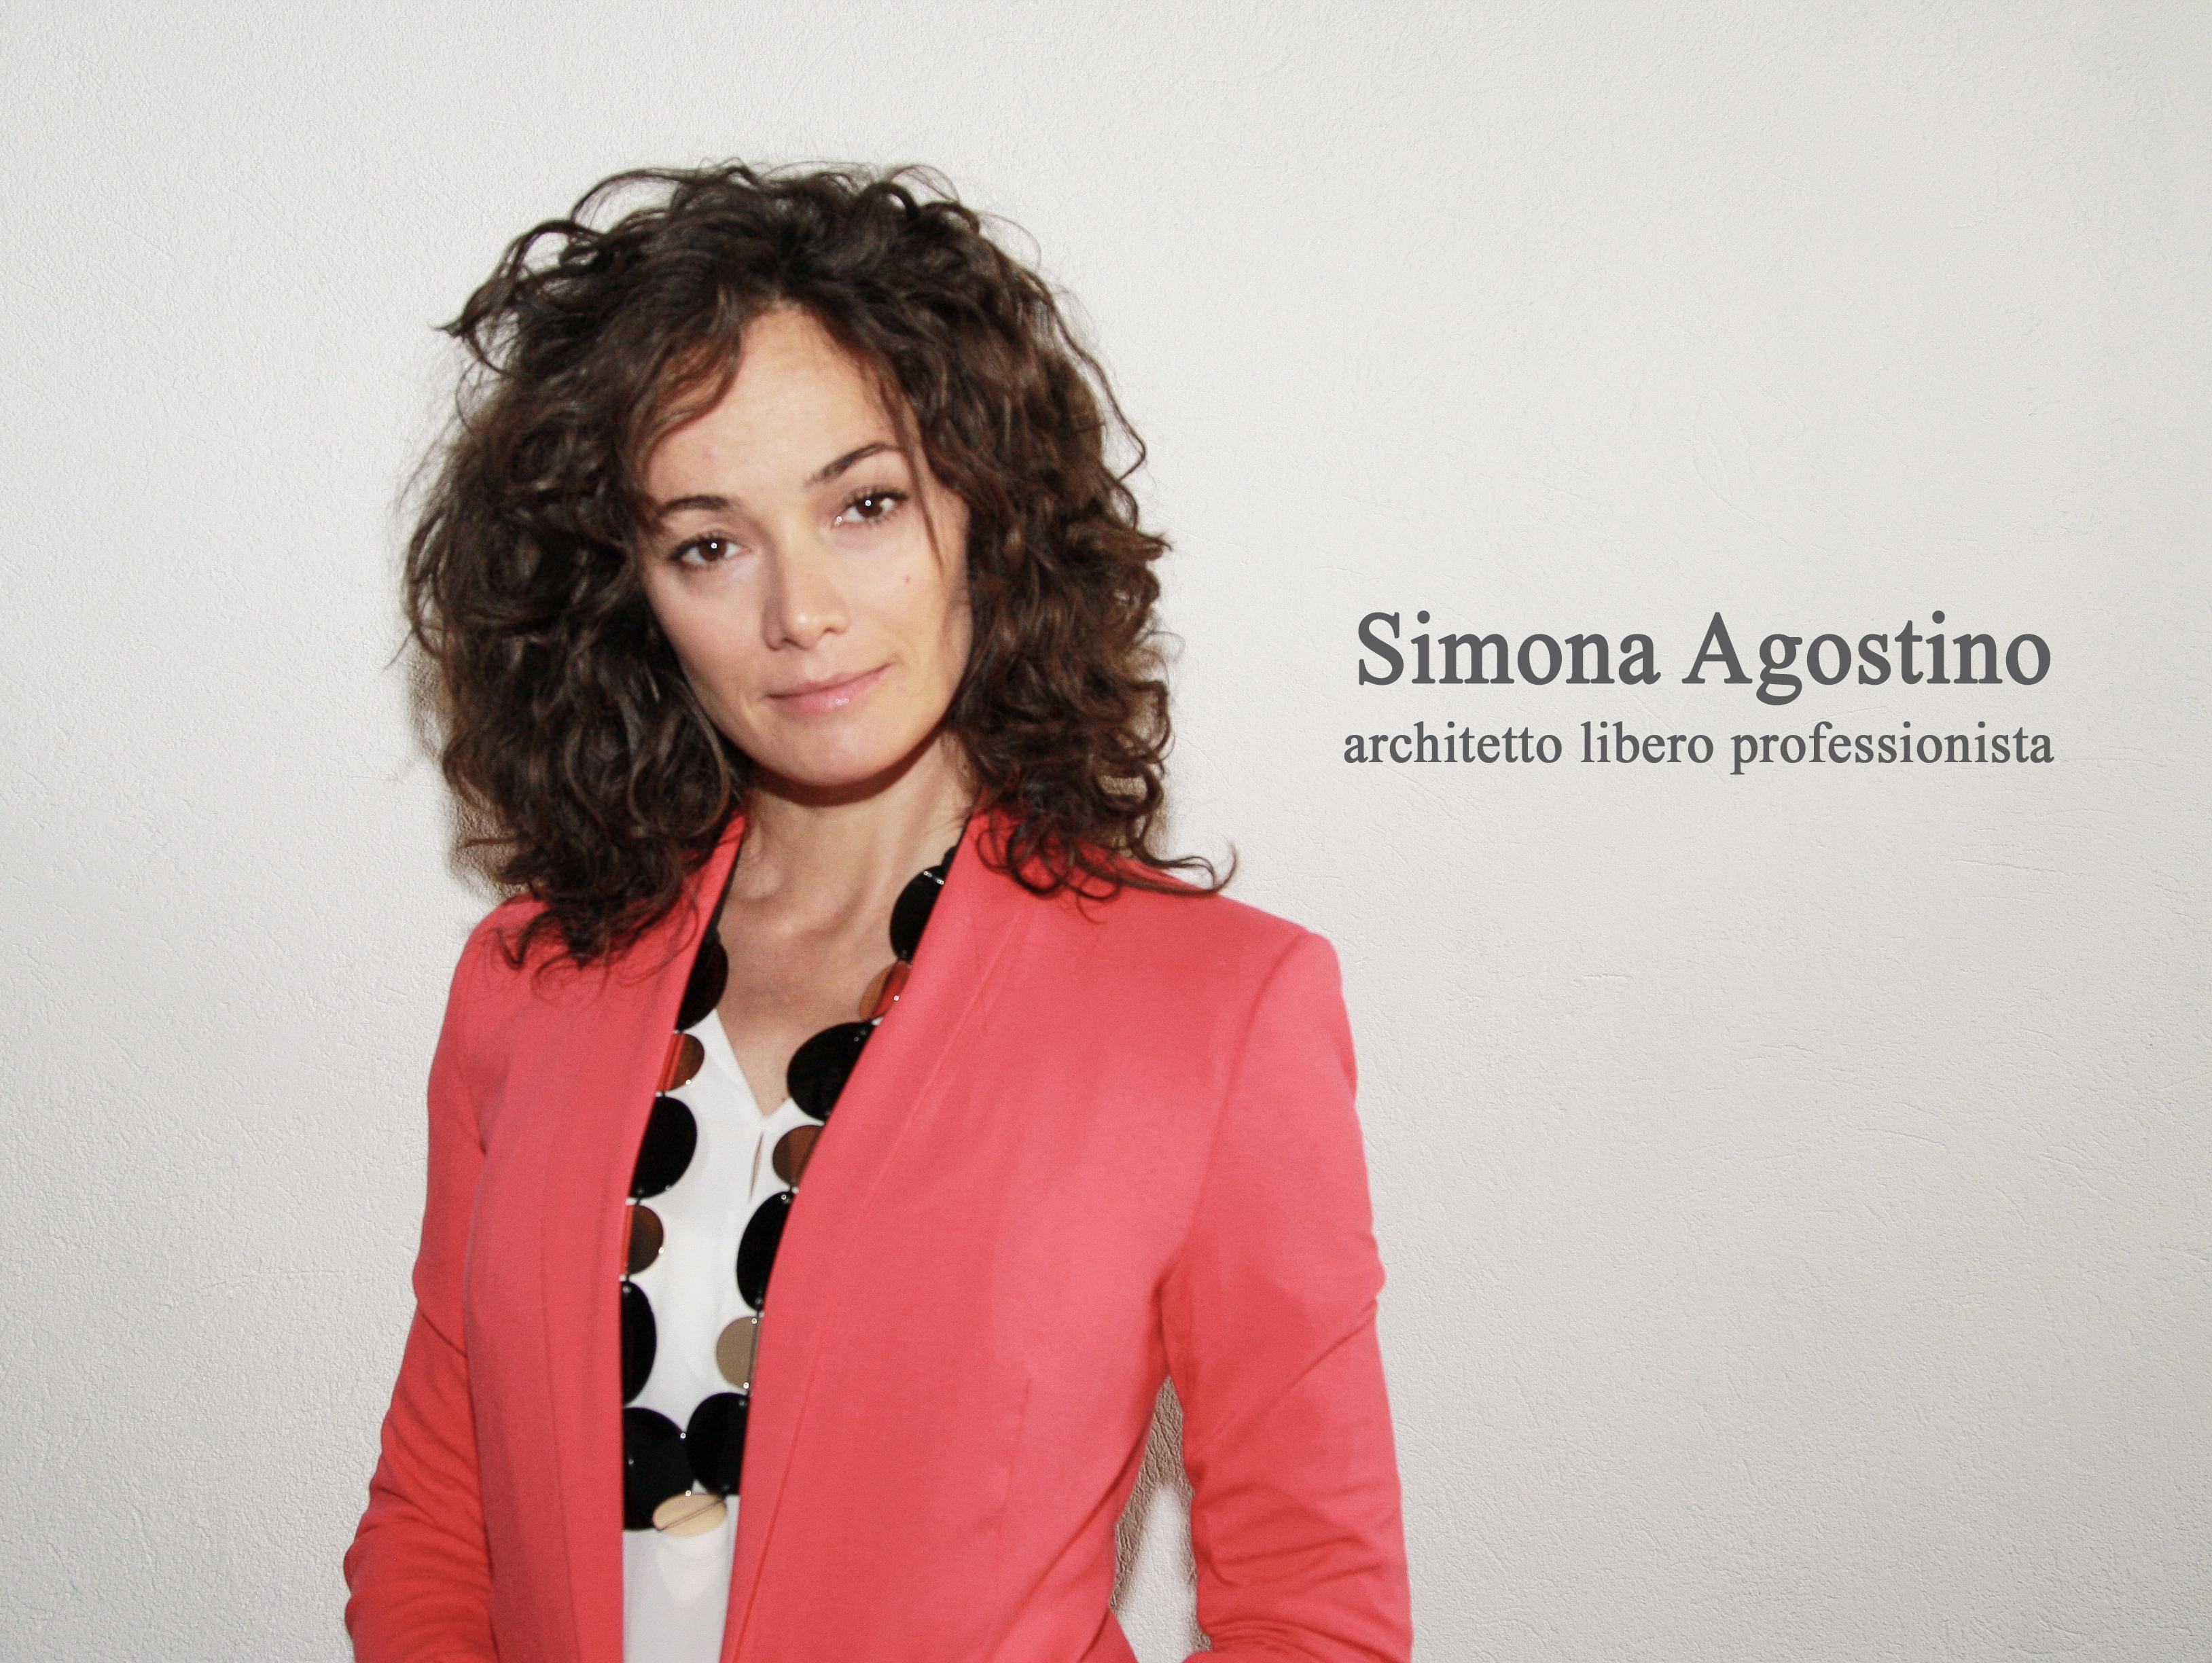 Simona Agostino